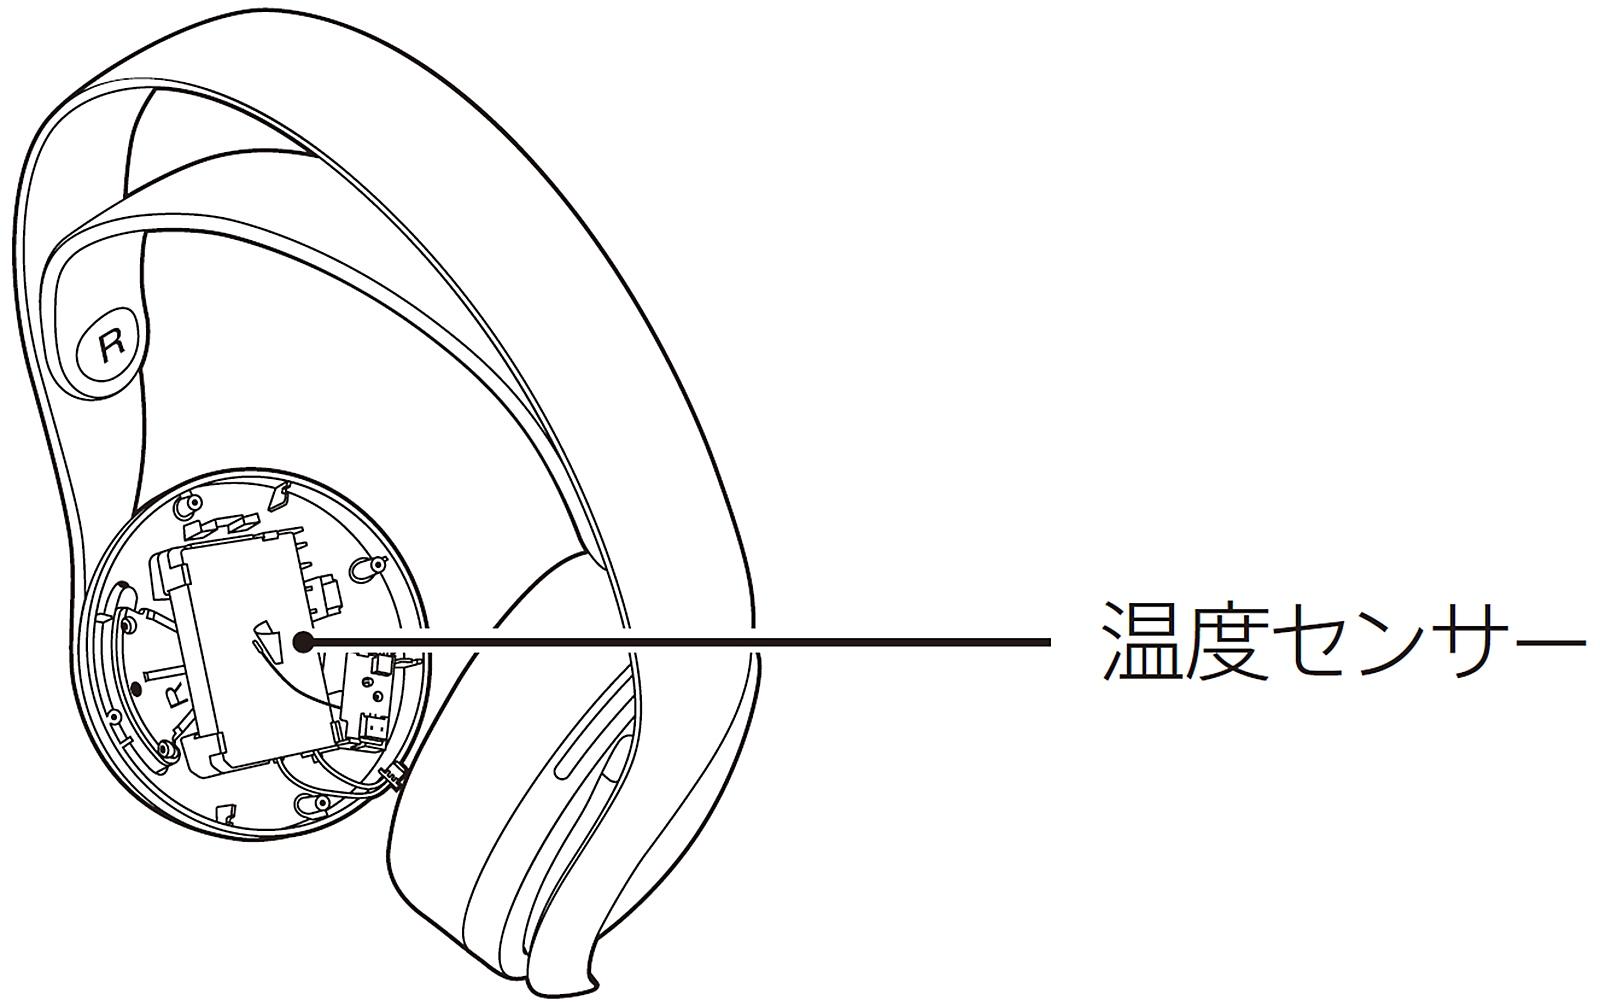 CFI-ZWH1J-image-block-remove-battery-04-ja-jp-28apr21.png